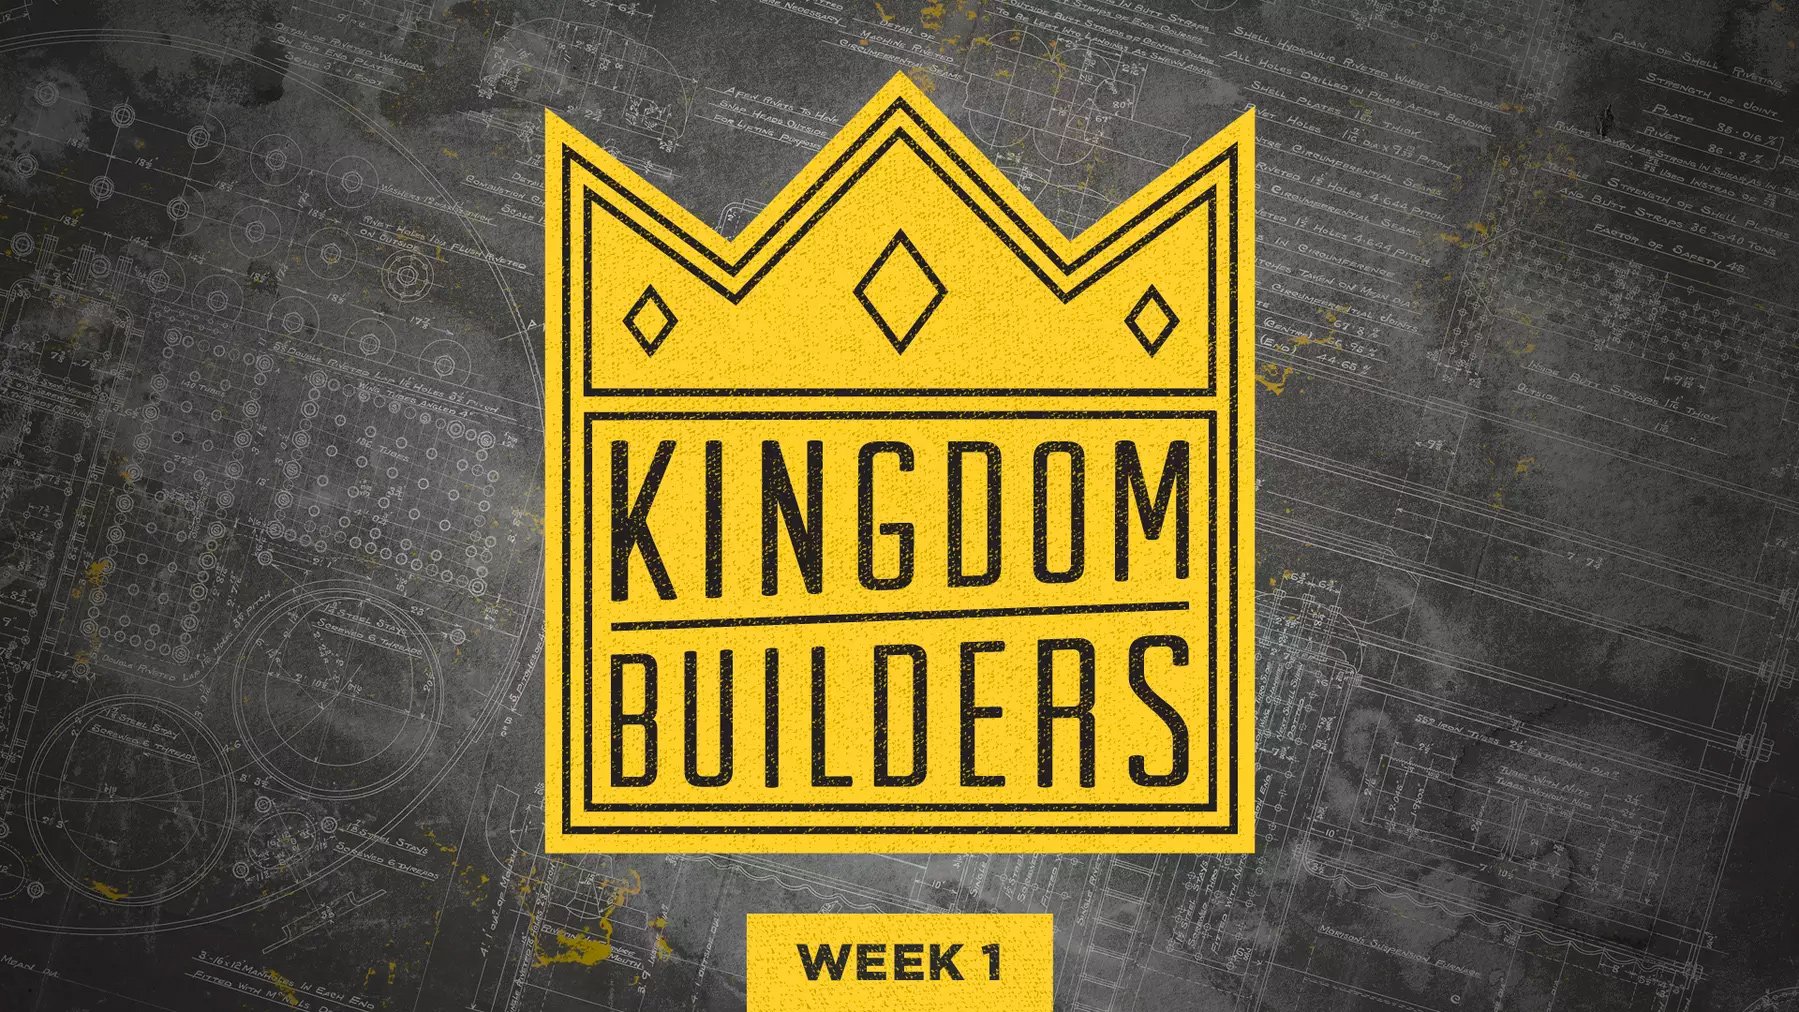 Kingdom Builders Sermon Series Idea